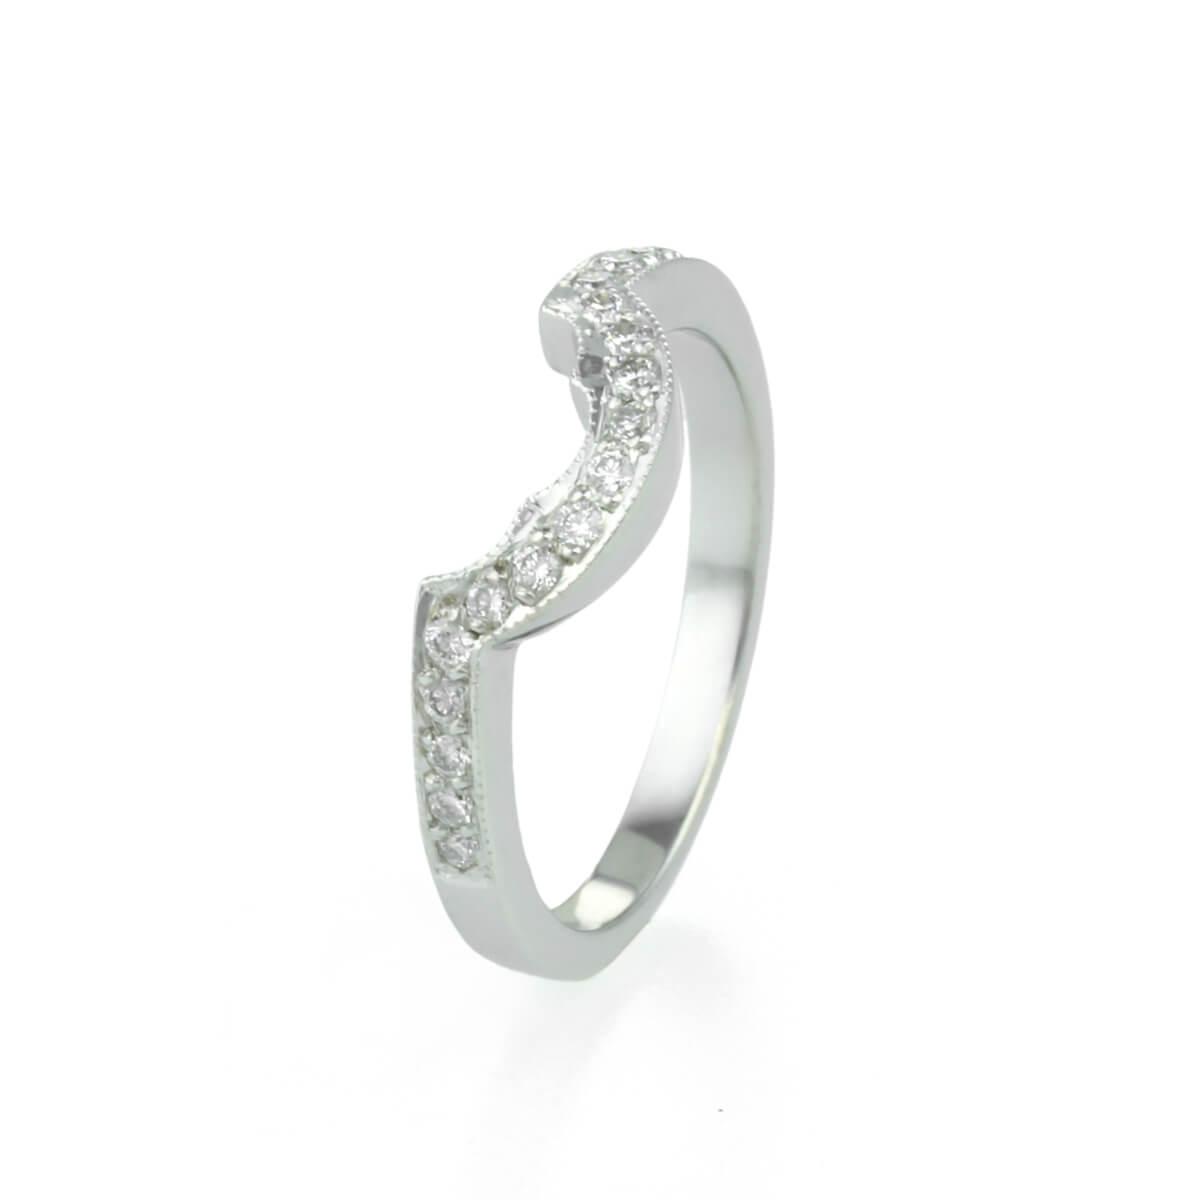 9ct White gold Grain Set Diamond Shaped Wedding Ring